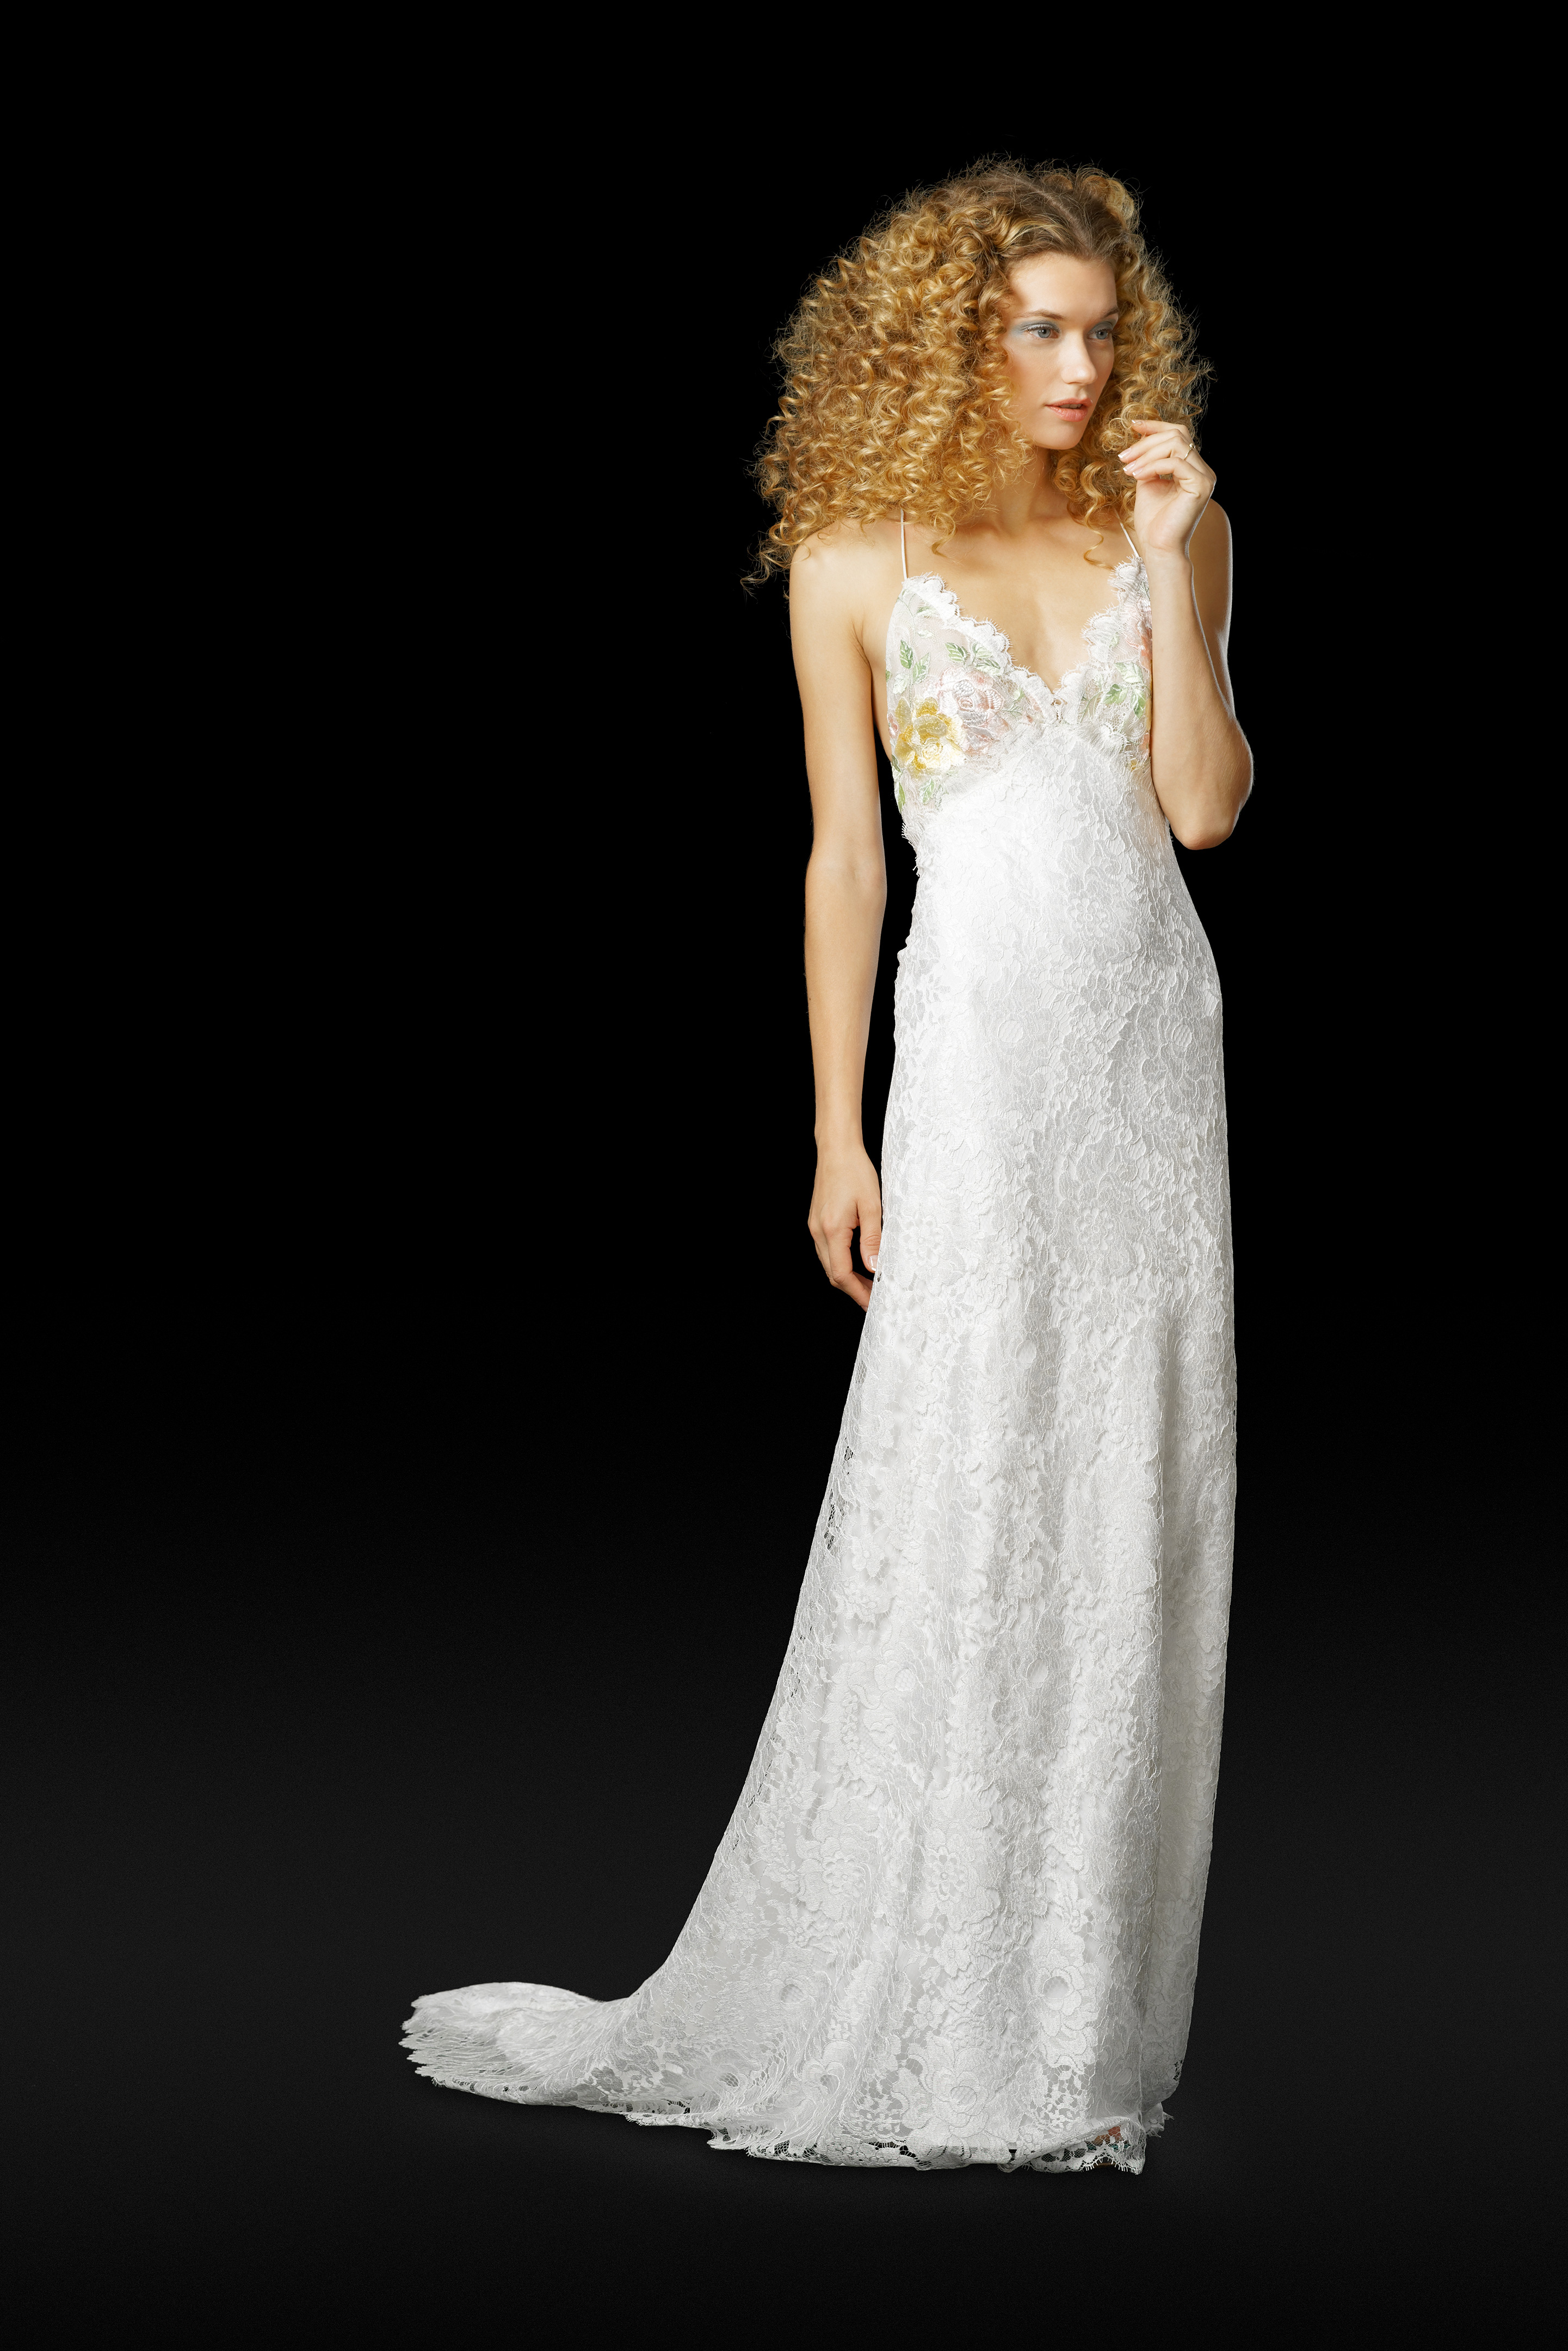 Elizabeth Fillmore Fall 2017 Wedding Dress Collection - Trudie